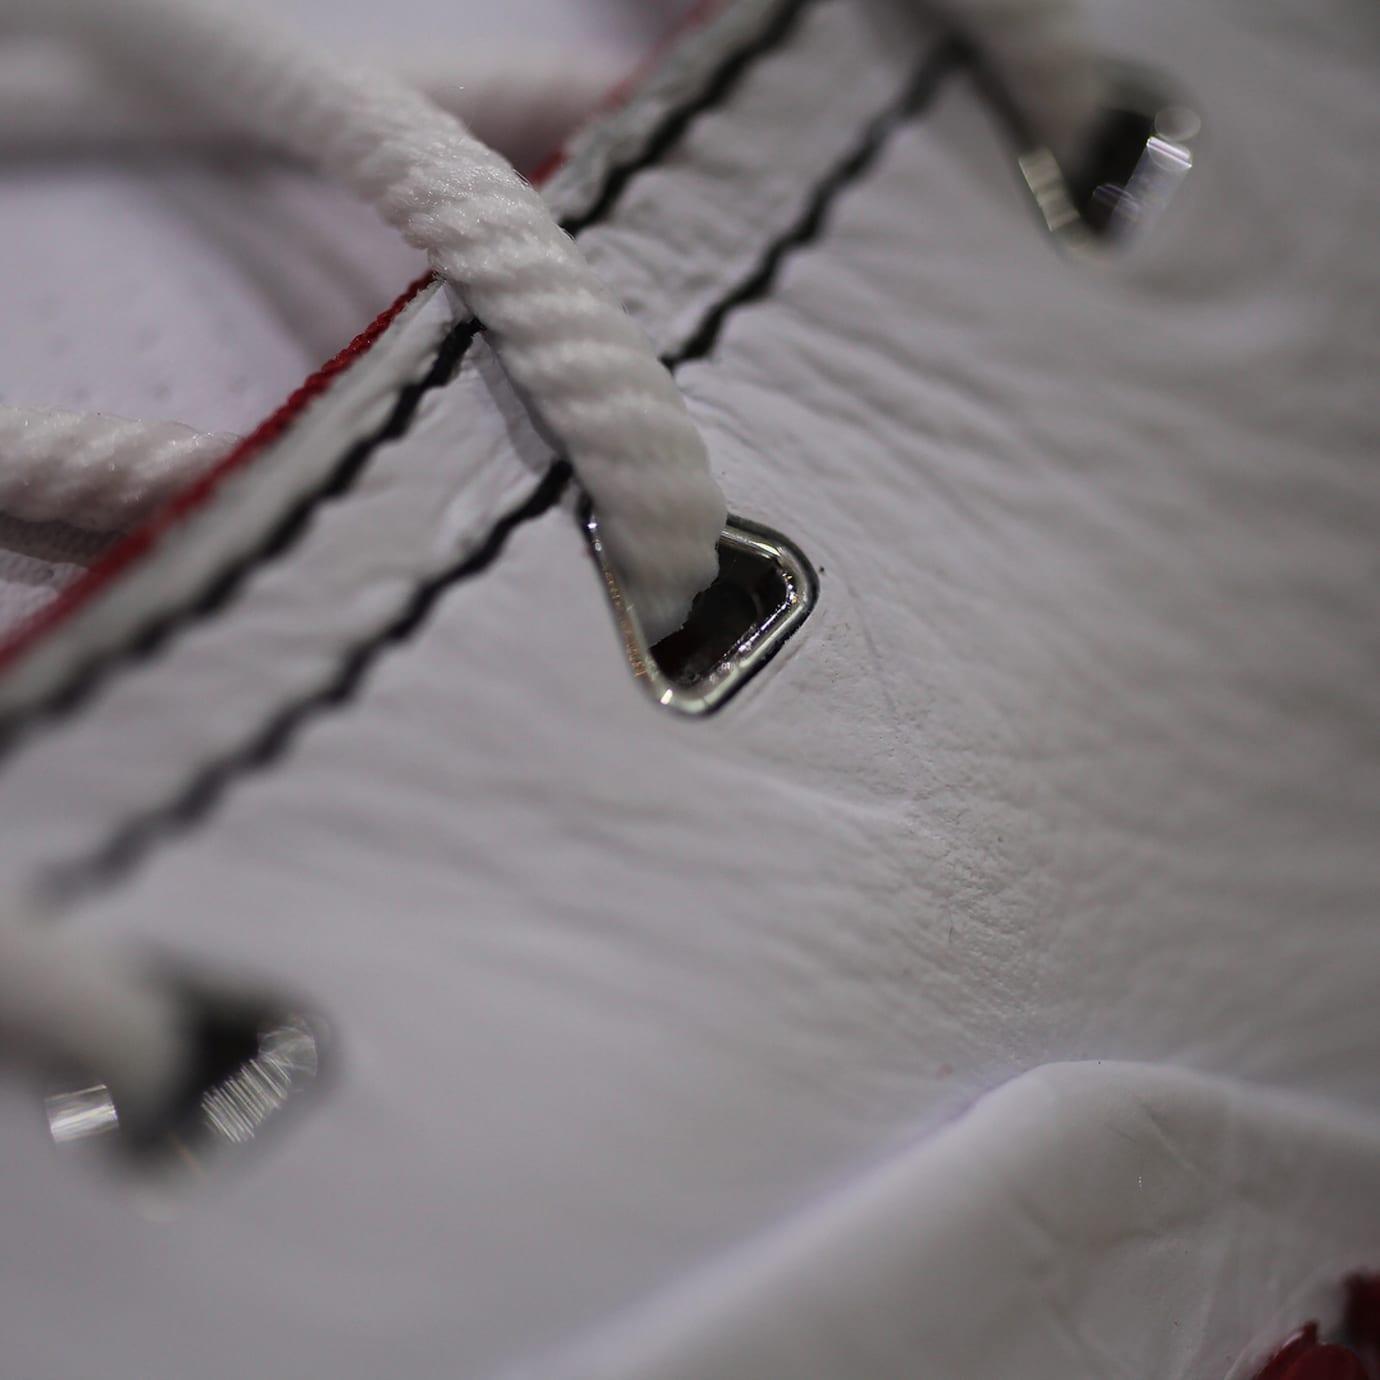 Nike Zoom Kobe 1 Protro All-Star Release Date AQ2728-102 Eyelet